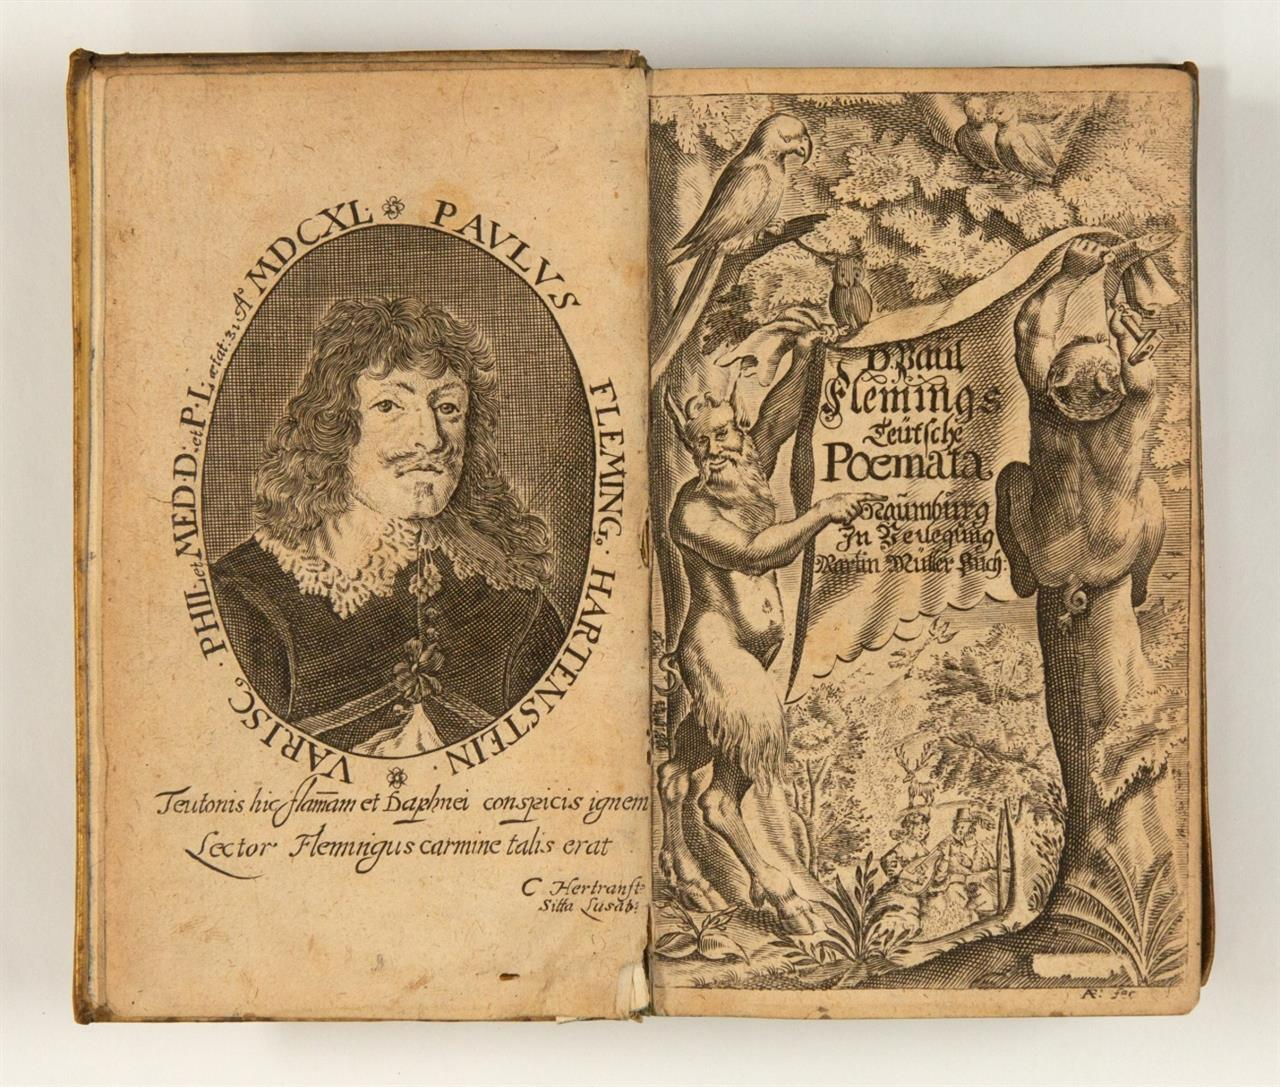 Paul Fleming, Teutsche Poemata. Jena 1666.